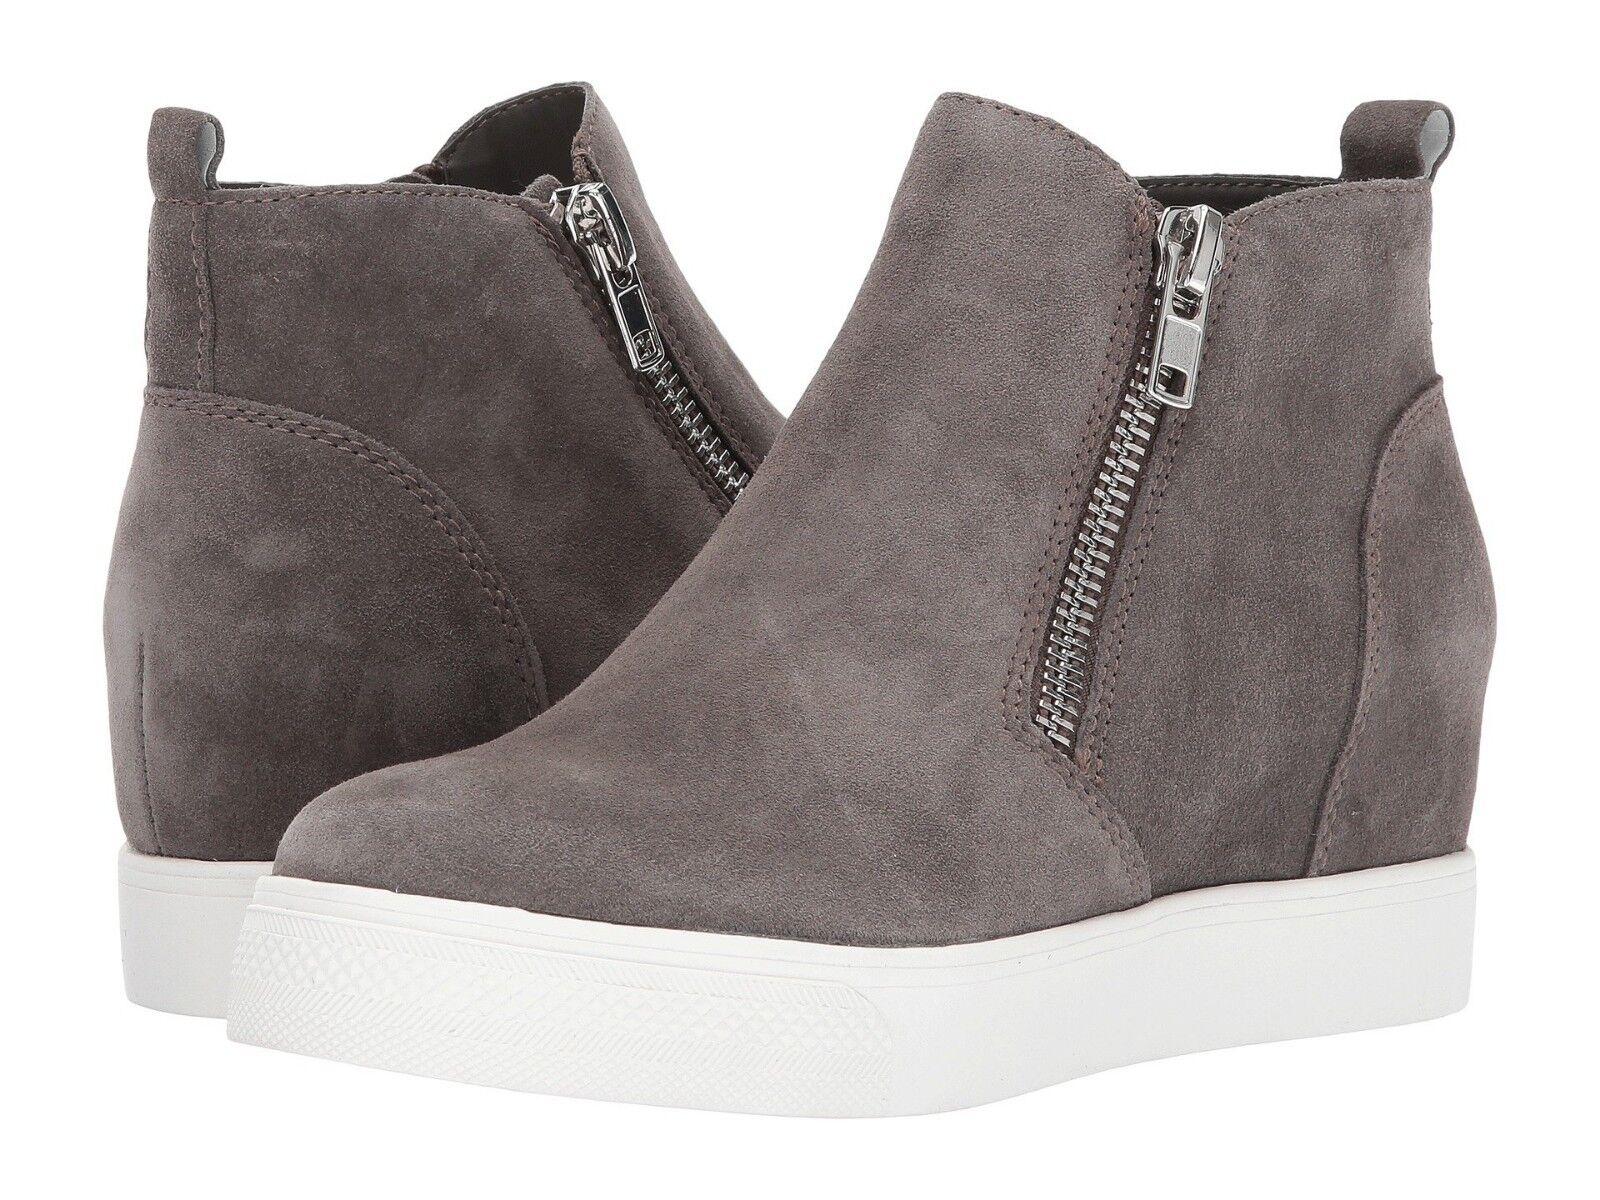 Steve Madden Women's Wedgie Sneaker Grey Suede